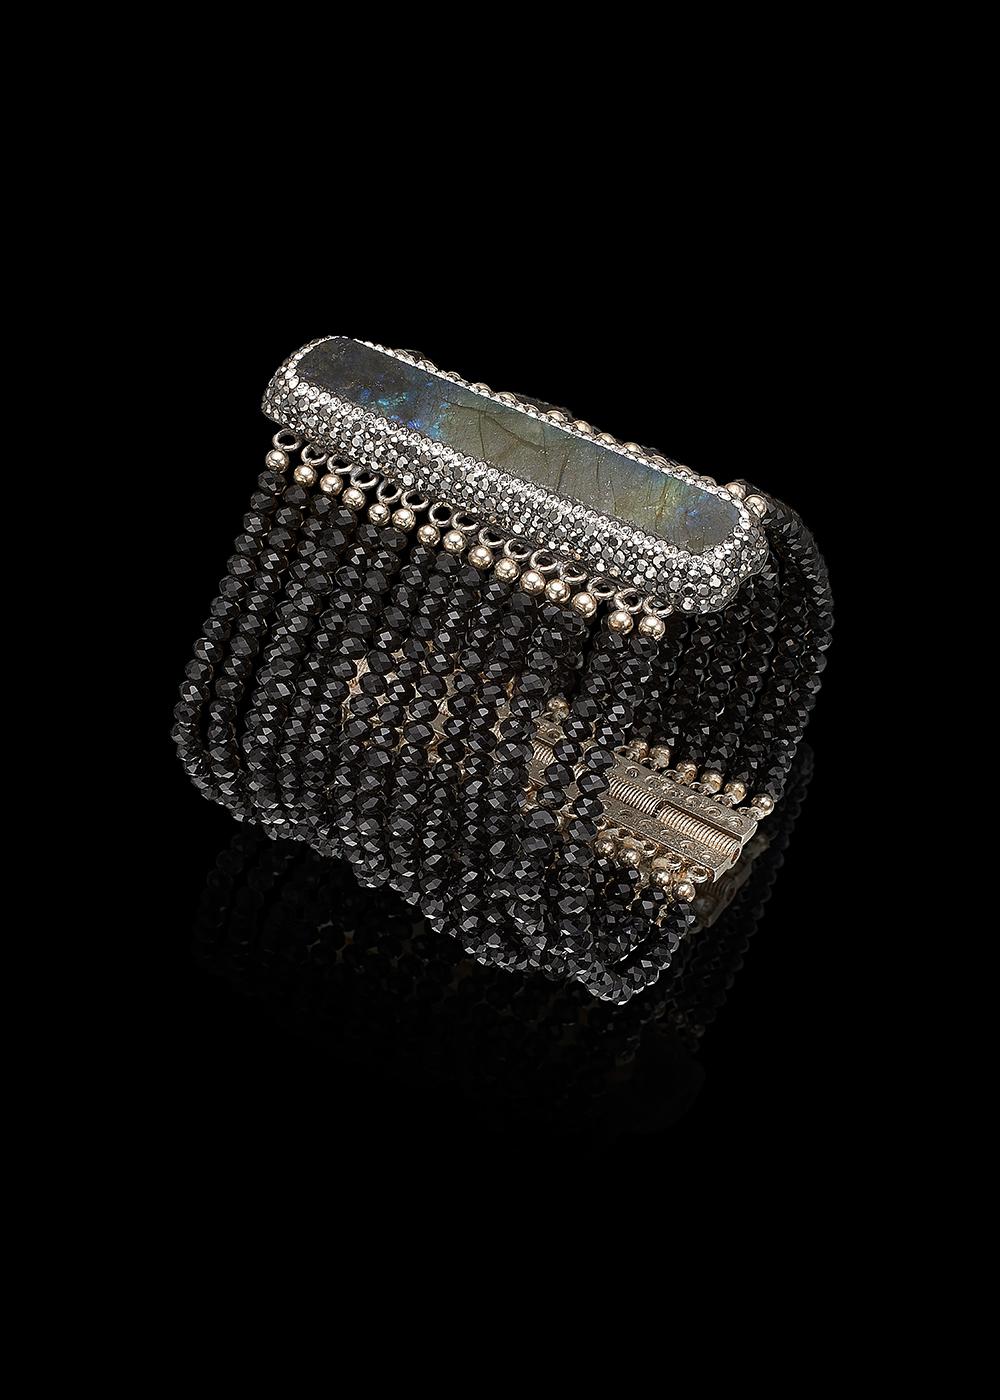 TACOMA bracelet with Black Onyx, Labradorite and Swarowski Crystals